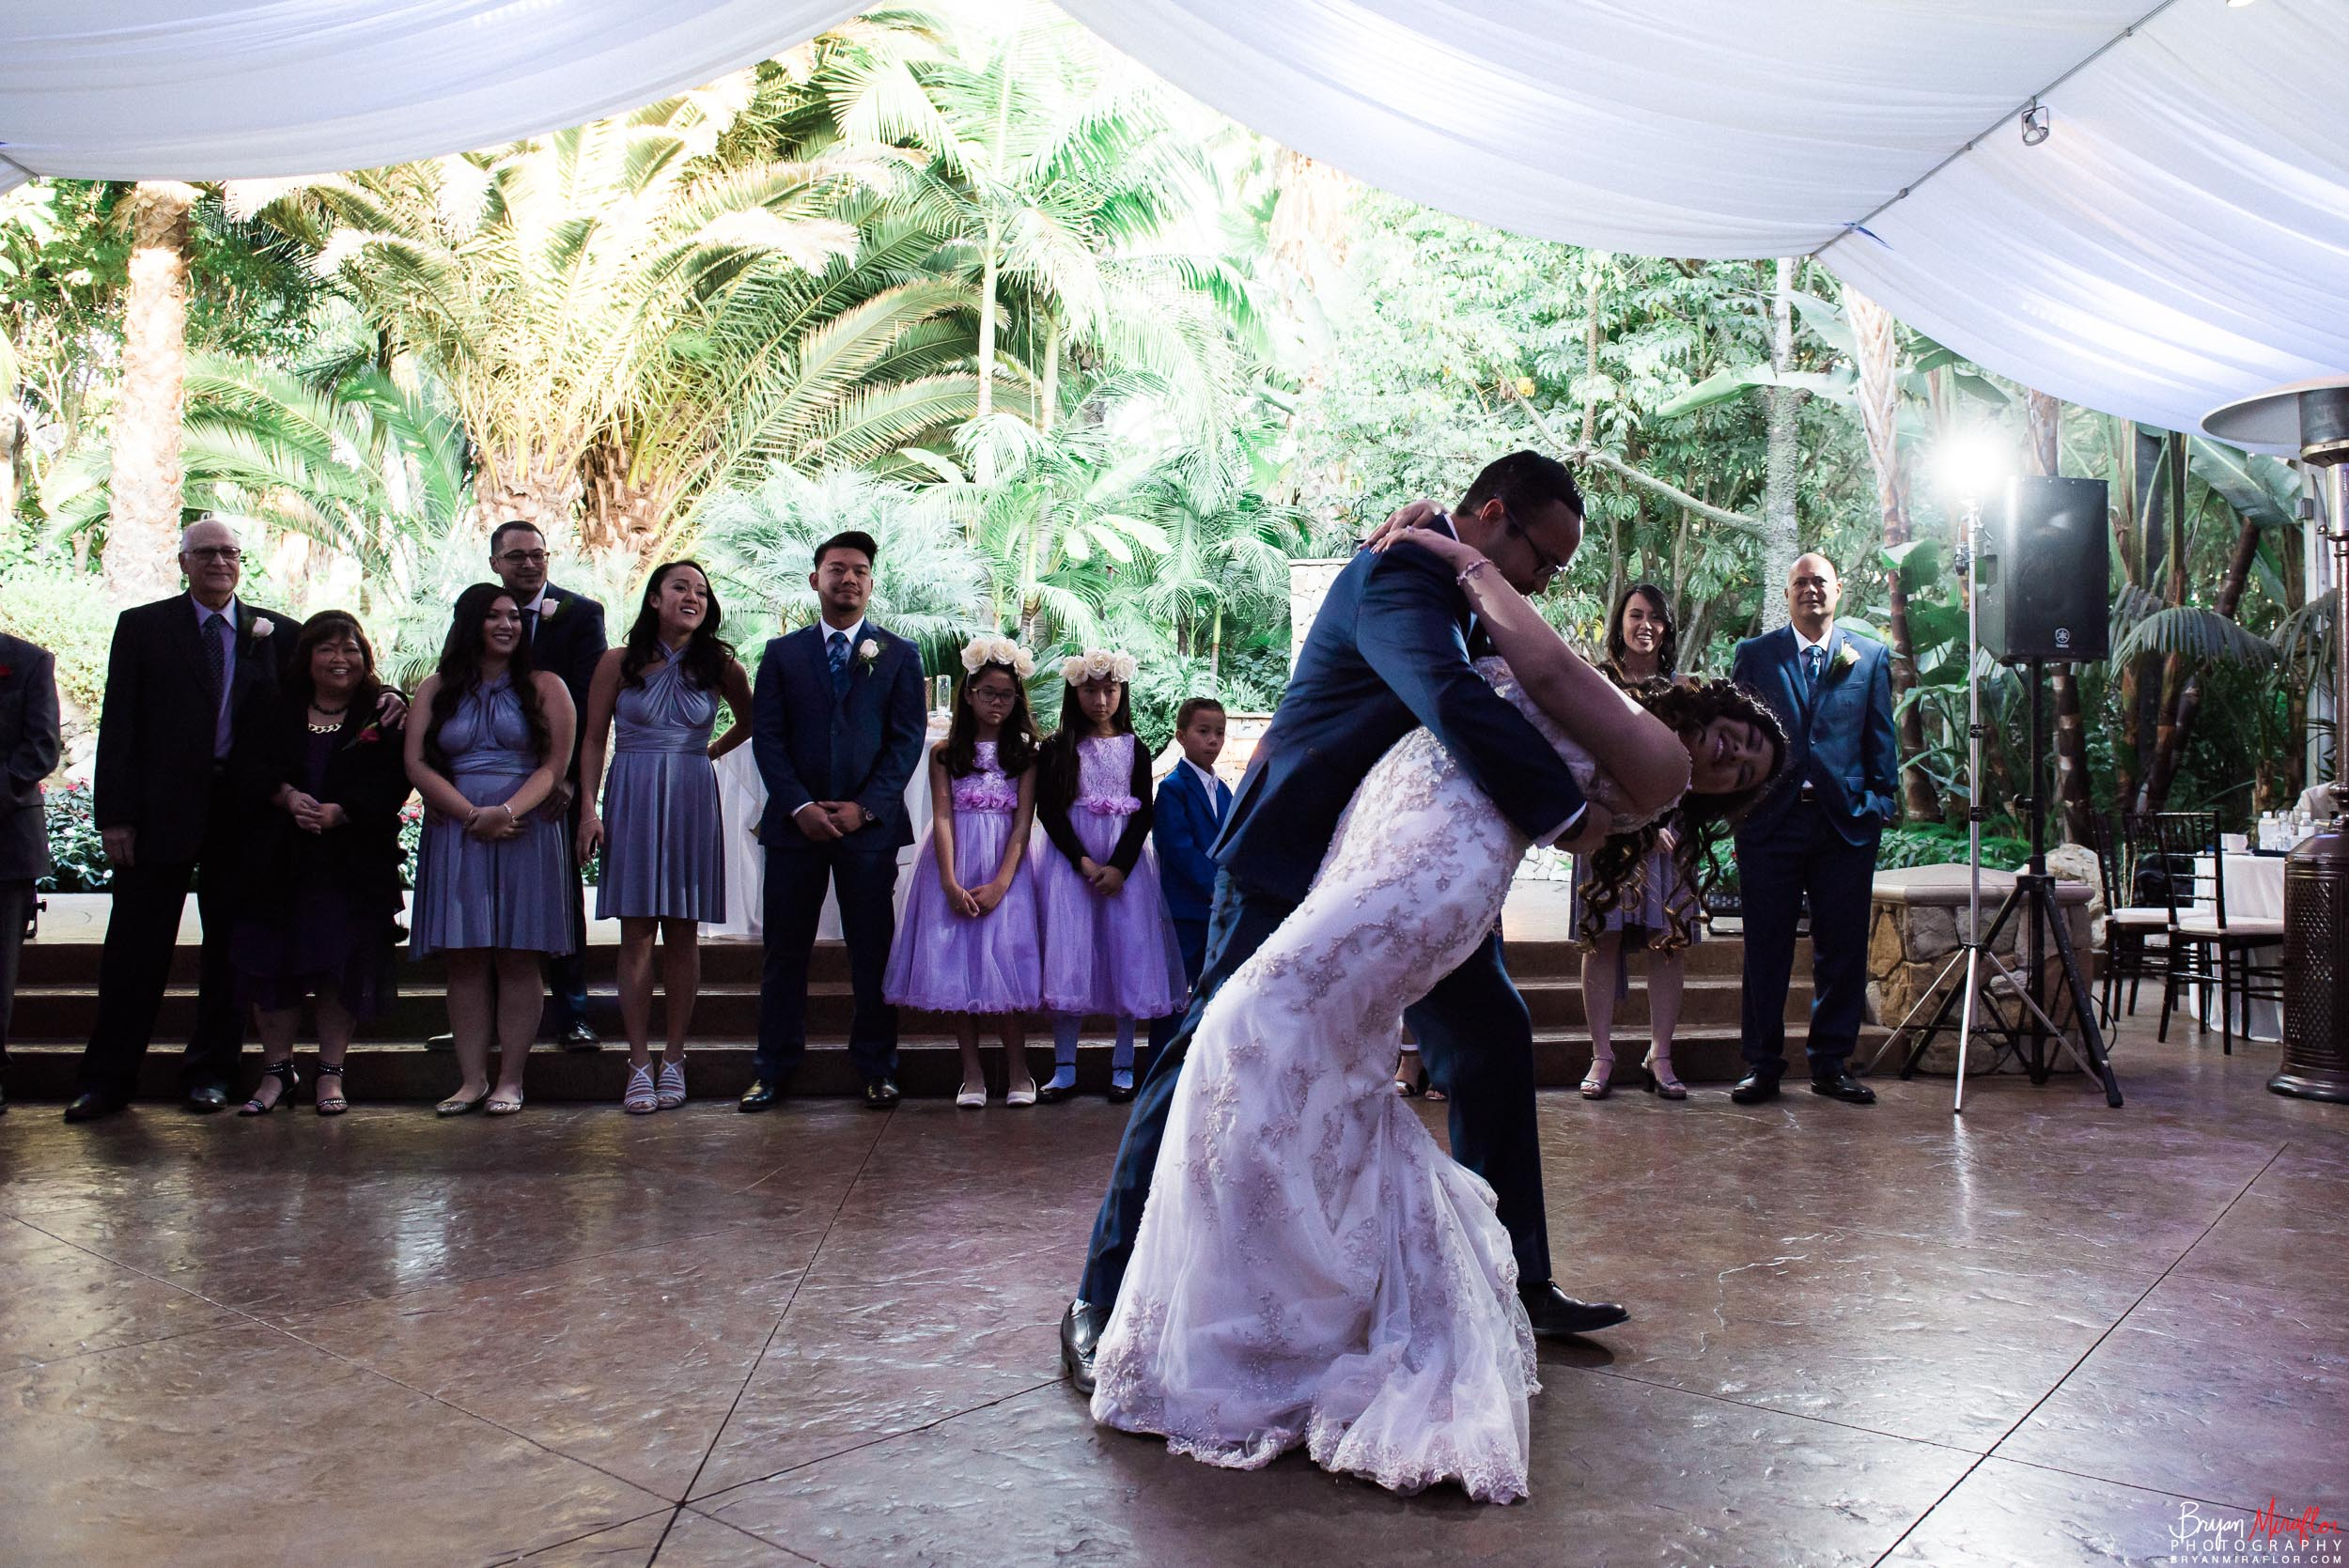 Bryan-Miraflor-Photography-Hannah-Jonathan-Married-Grand-Traditions-Estate-Gardens-Fallbrook-20171222-183.jpg